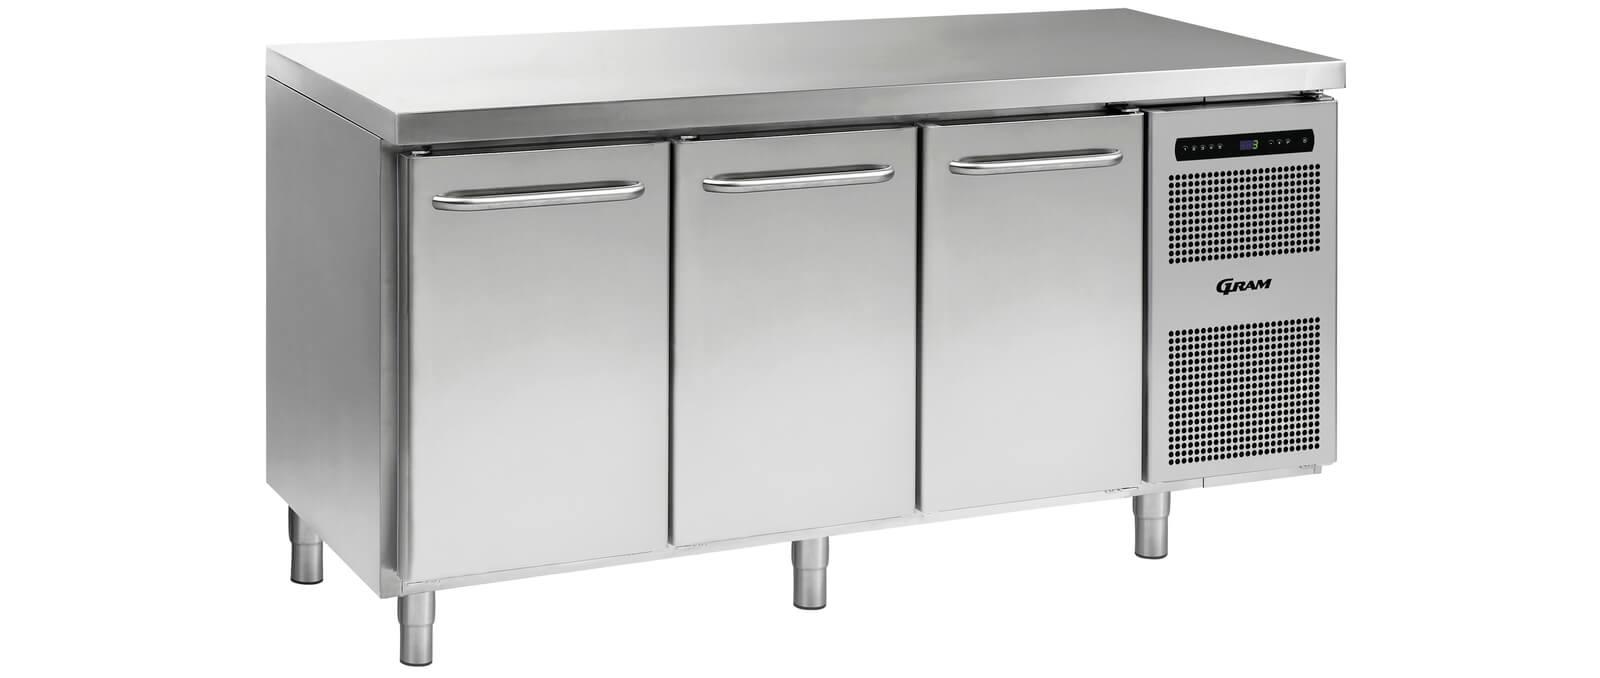 energy-efficient-bench-refrigeration